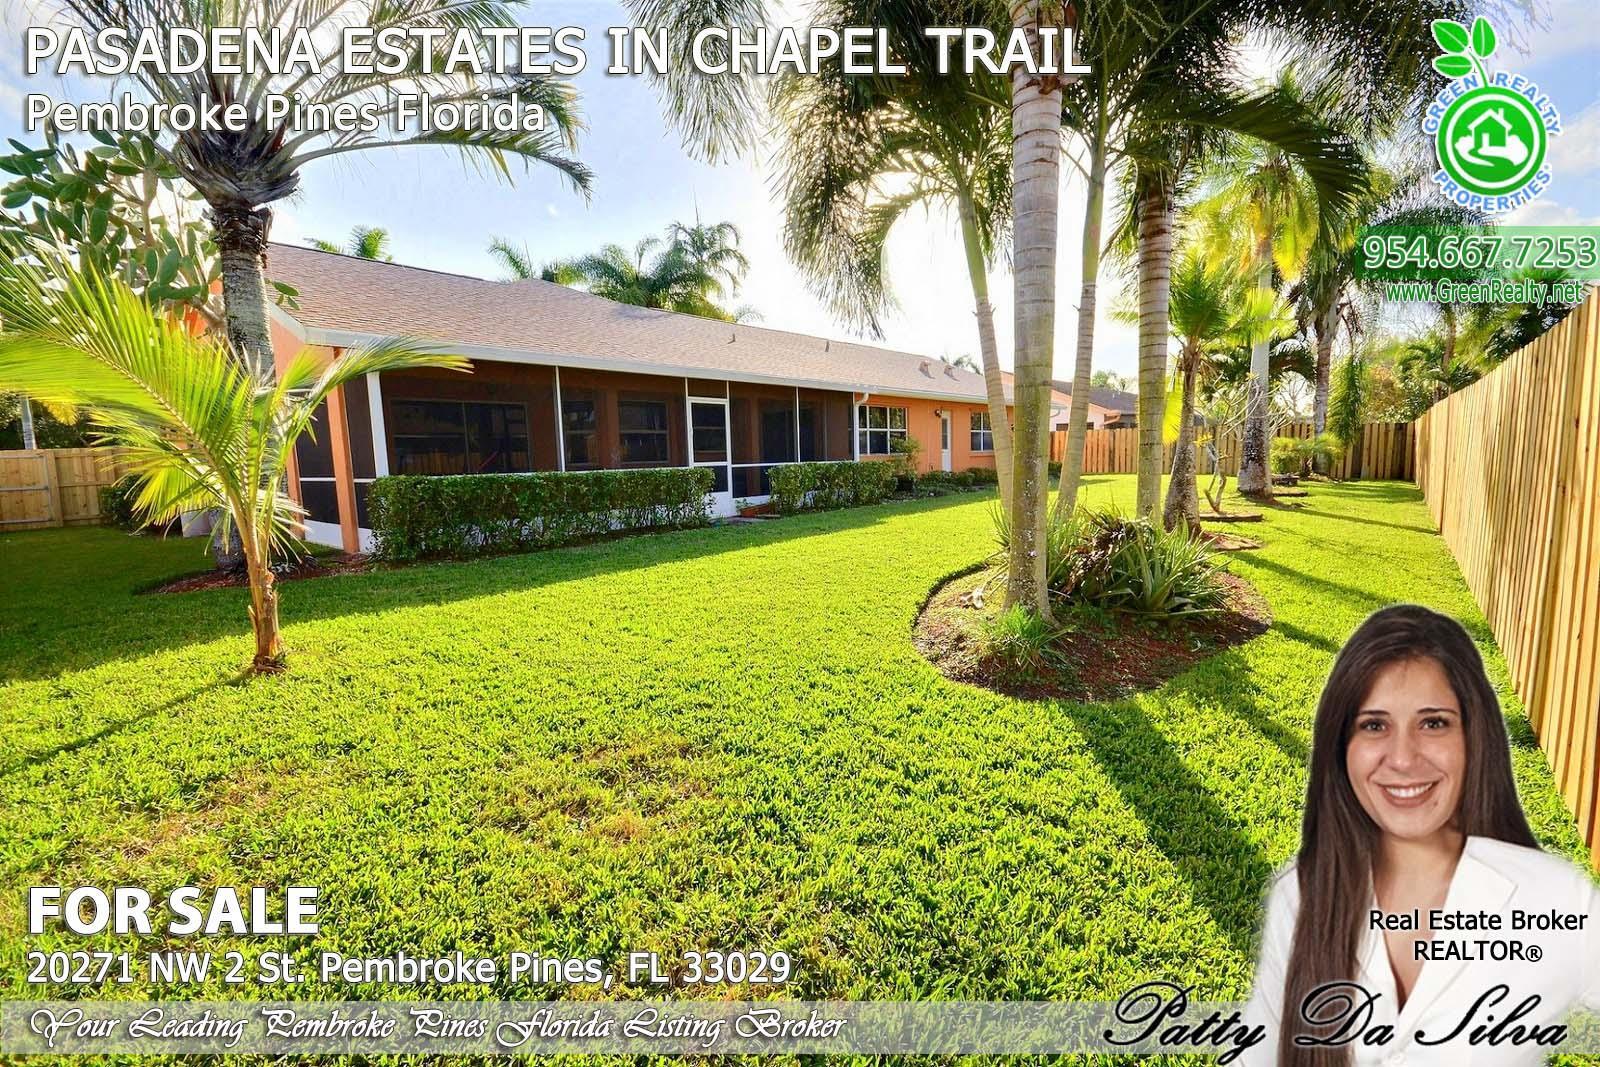 Pasadena Estates of Chapel Trail - Pembroke Pines FL real estate